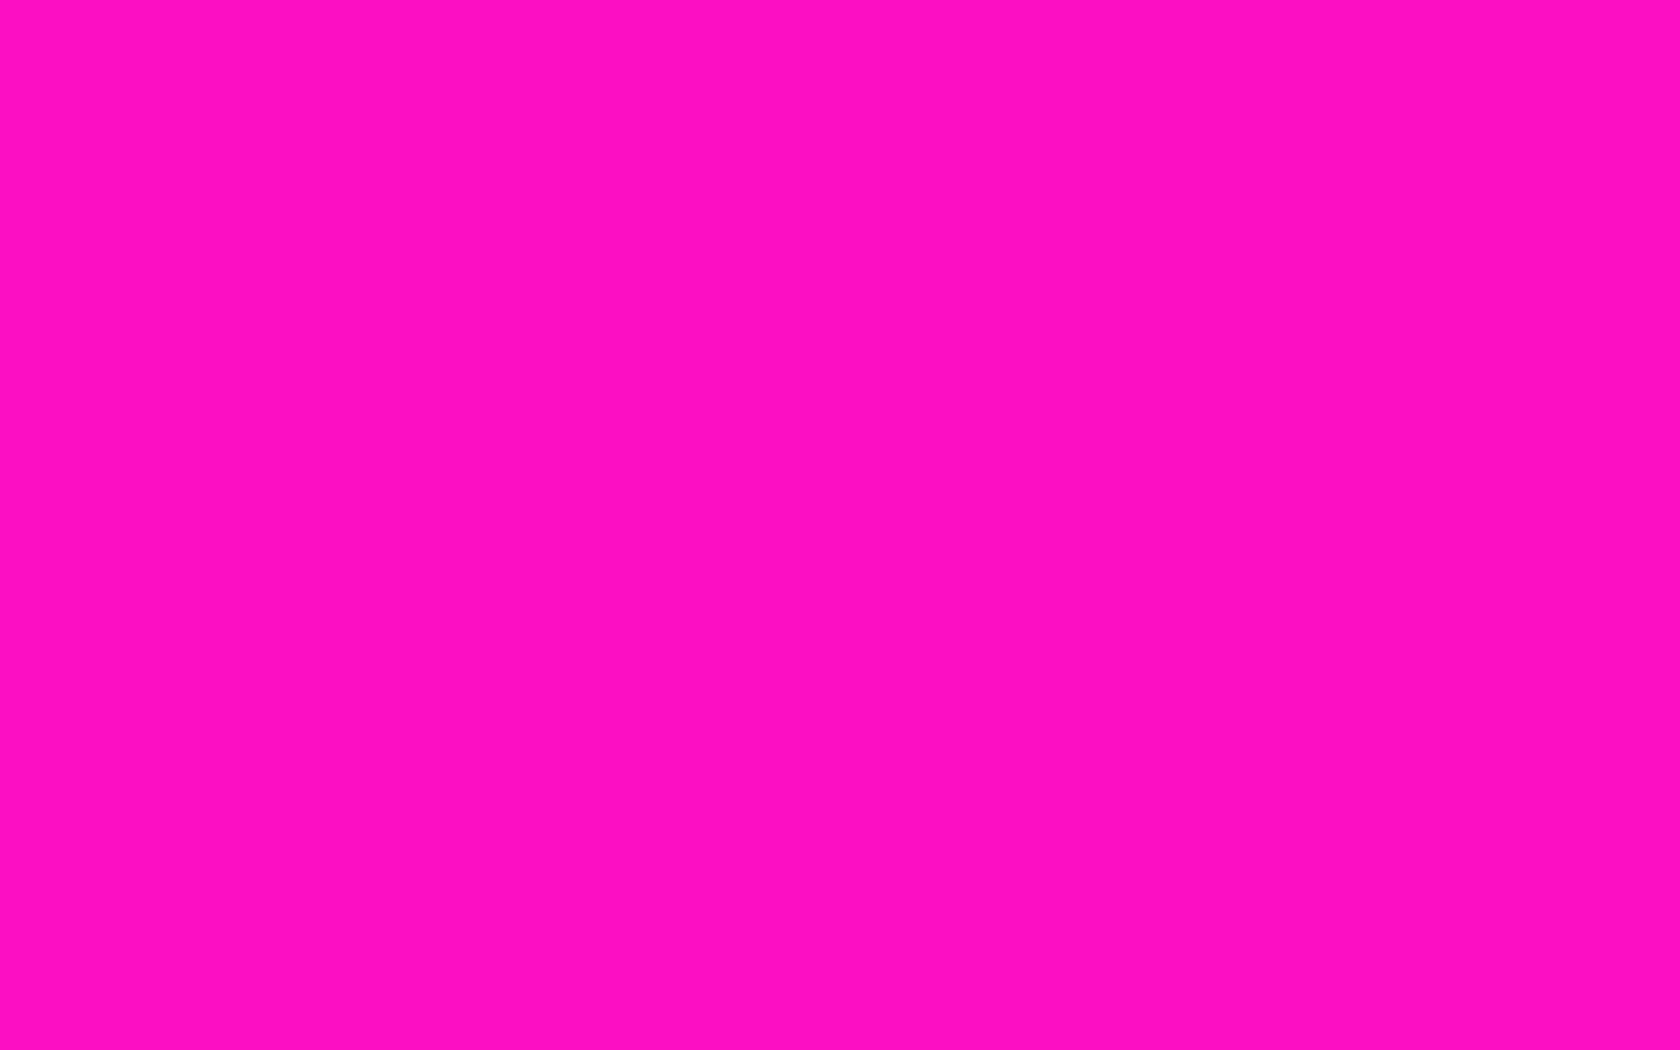 1680x1050 Shocking Pink Solid Color Background